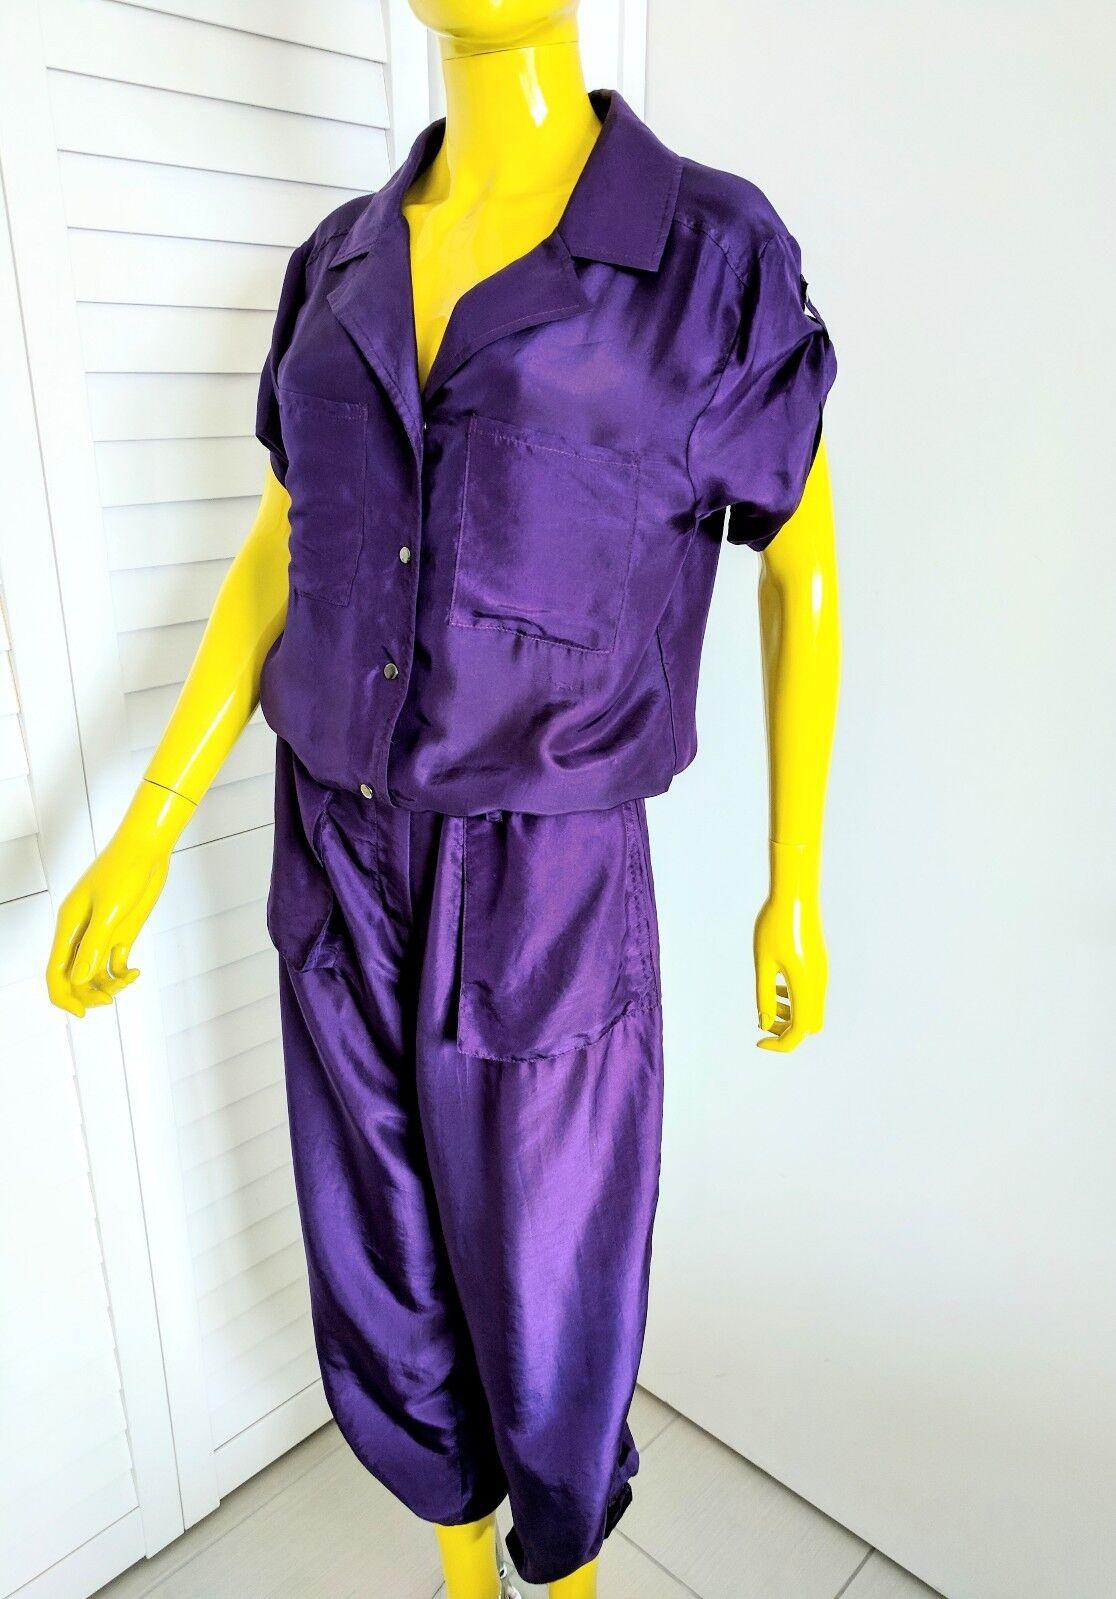 DEBORAH SWEENEY 100% Silk Romper Jumpsuit Size 6 Original Retail  614.00